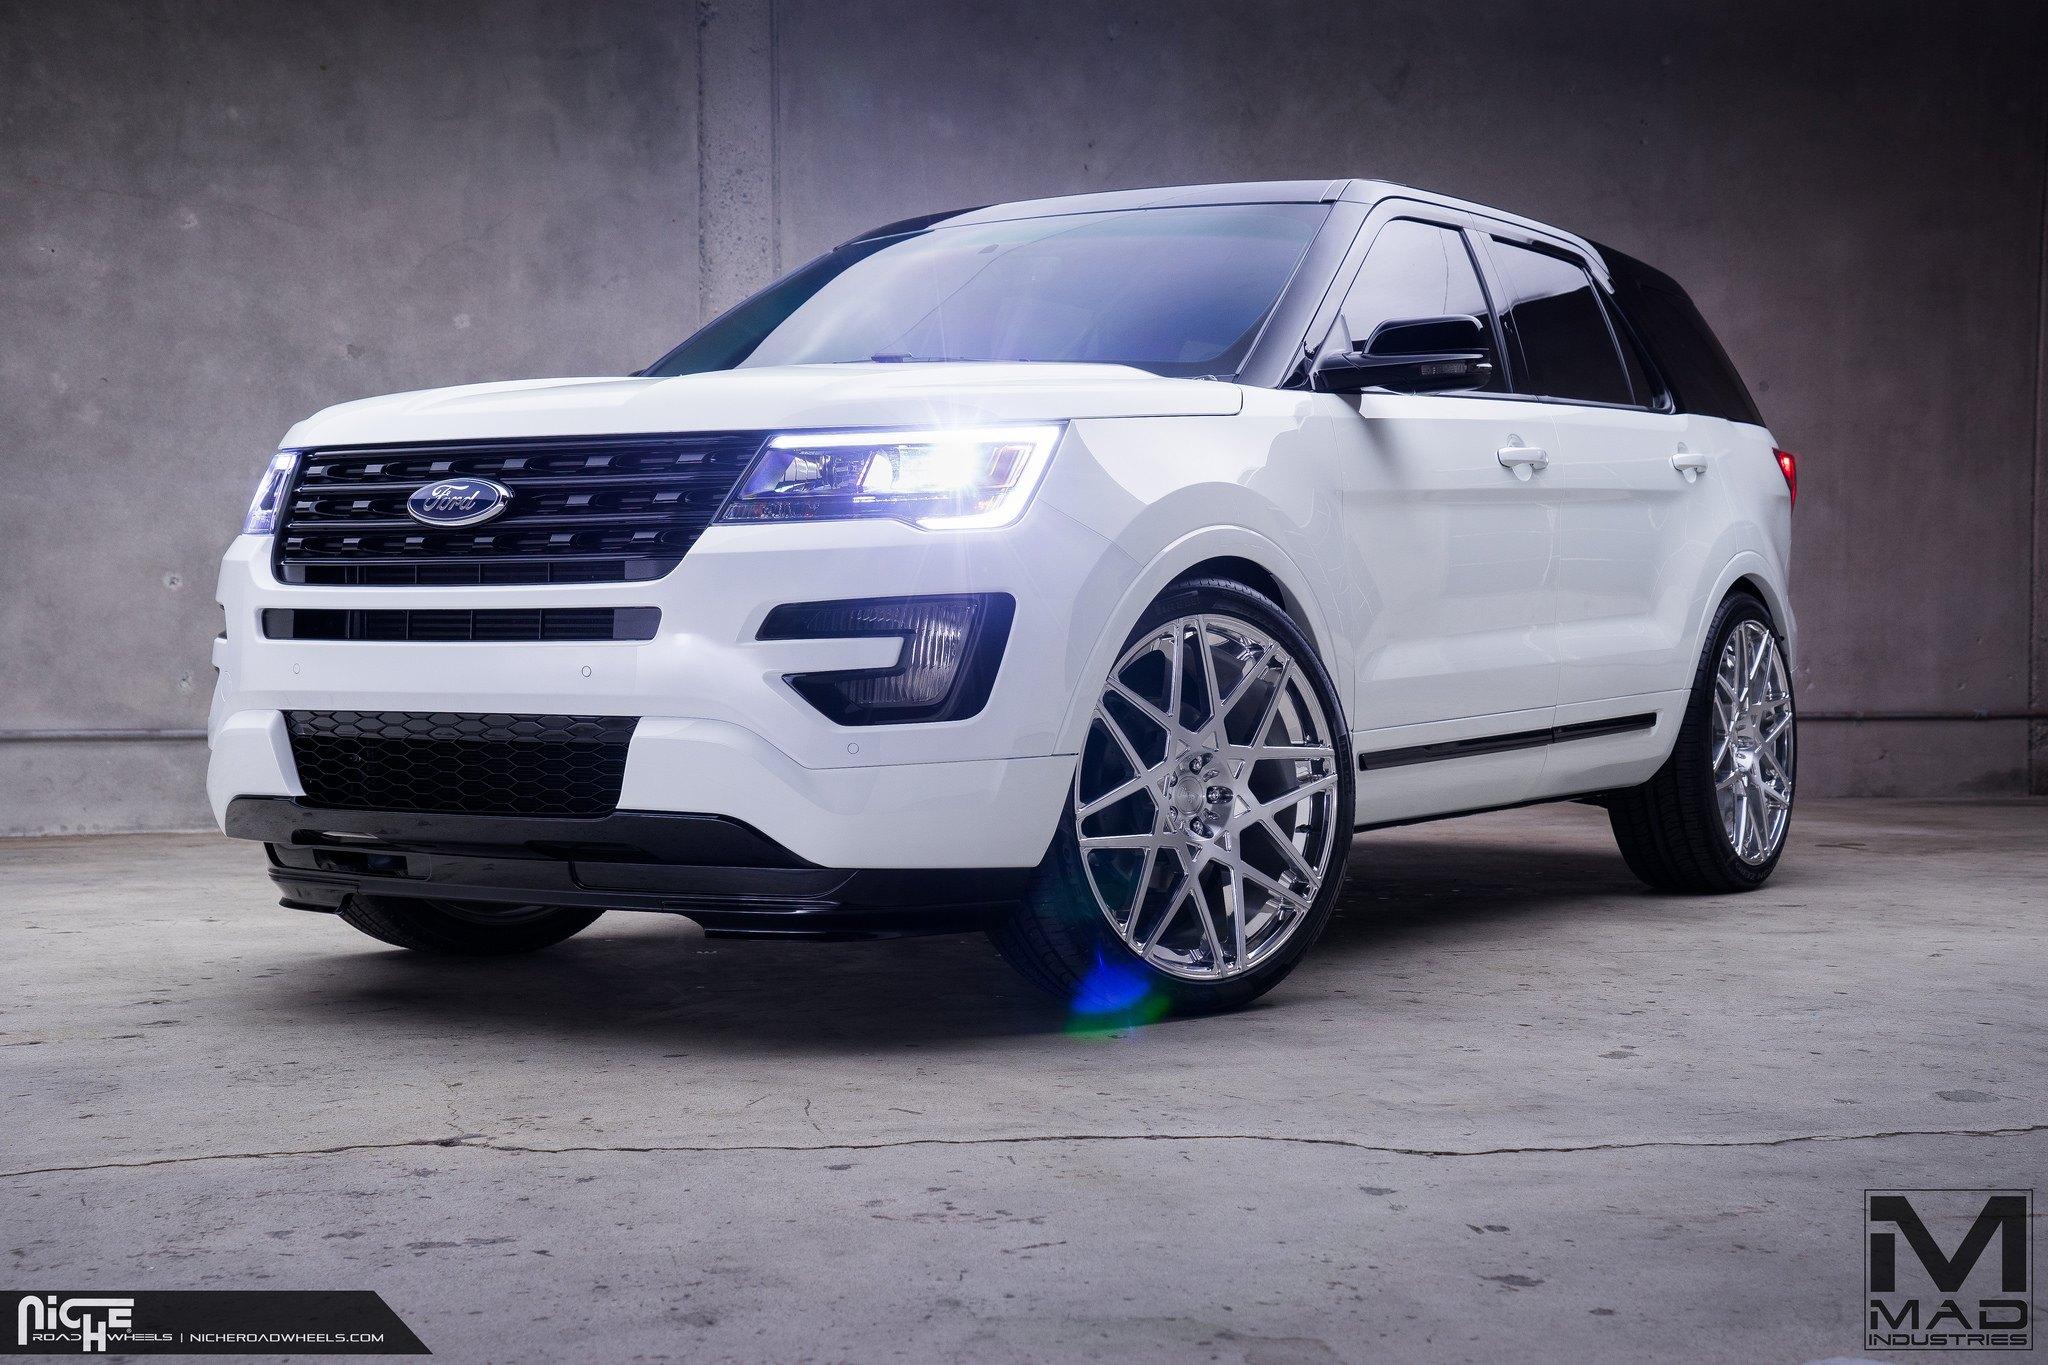 Ford Explorer Black Rims >> Black Top Ford Explorer On Niche Alpine D Custom Wheels